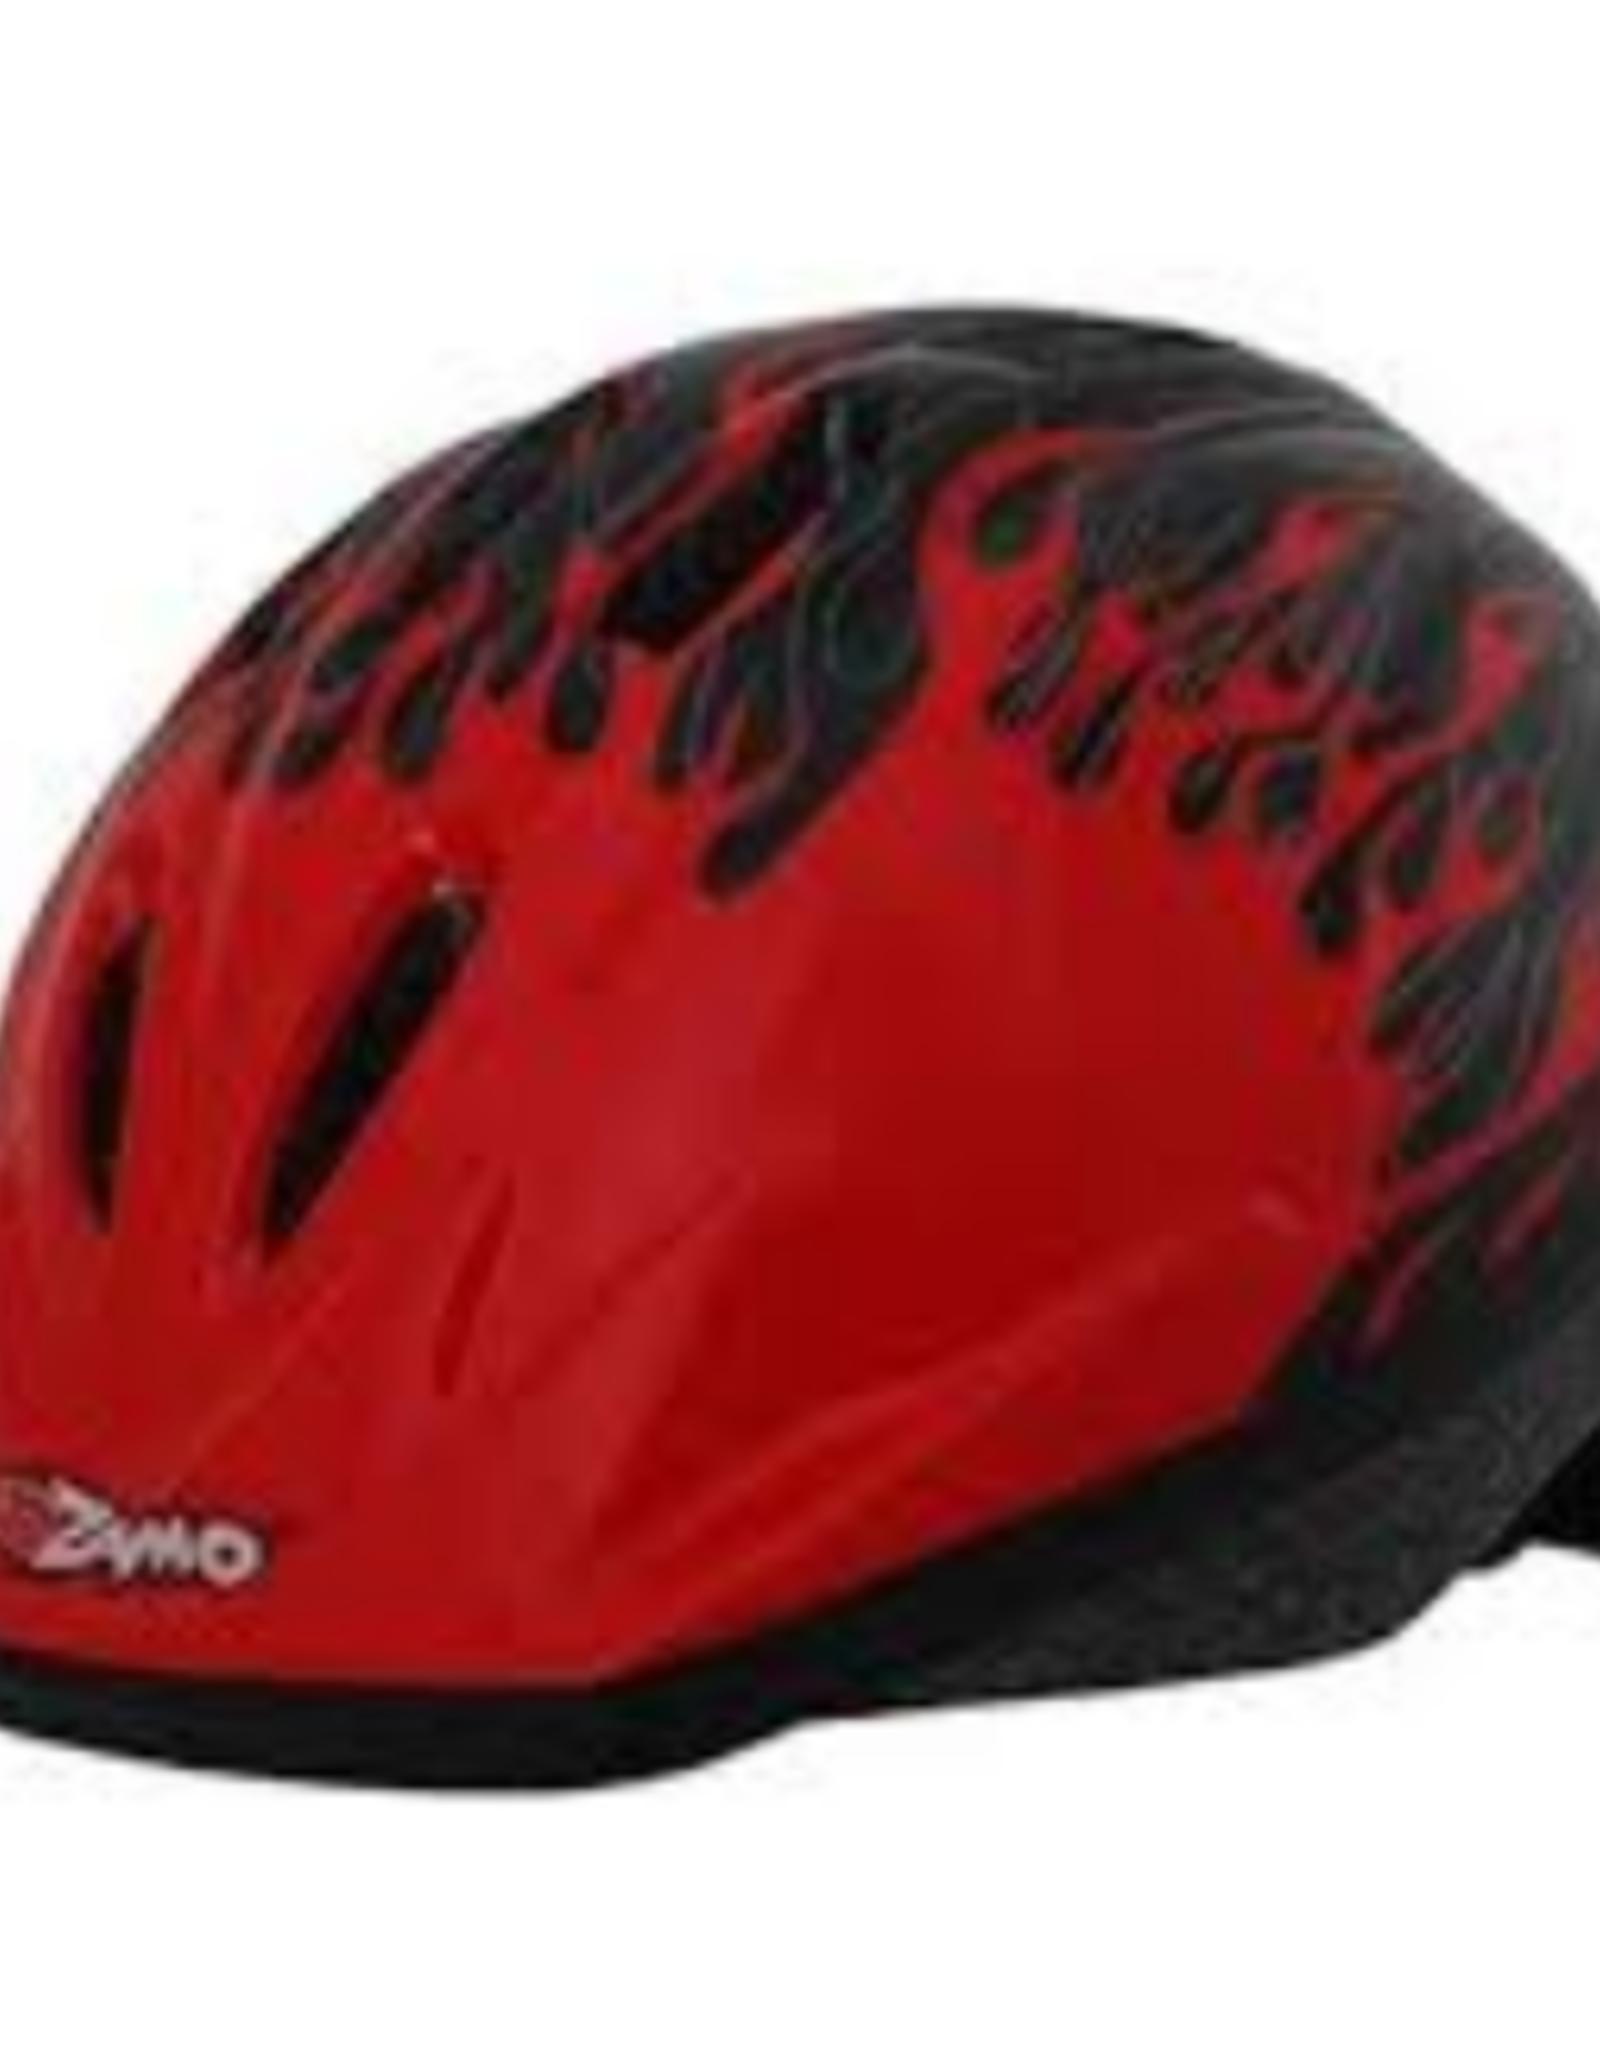 J & B Importers Kidzamo Helmet SM-MD Flame RED/BLACK